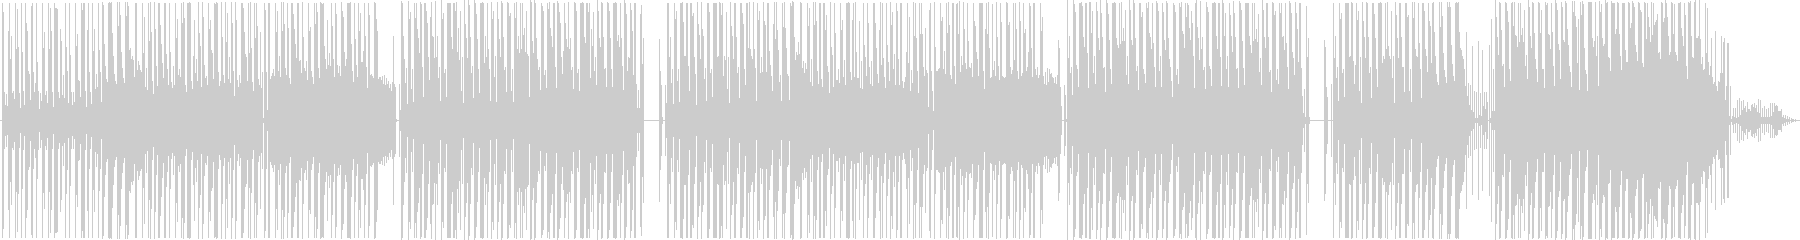 snoop doggっぽいヒップホップの未再生の波形